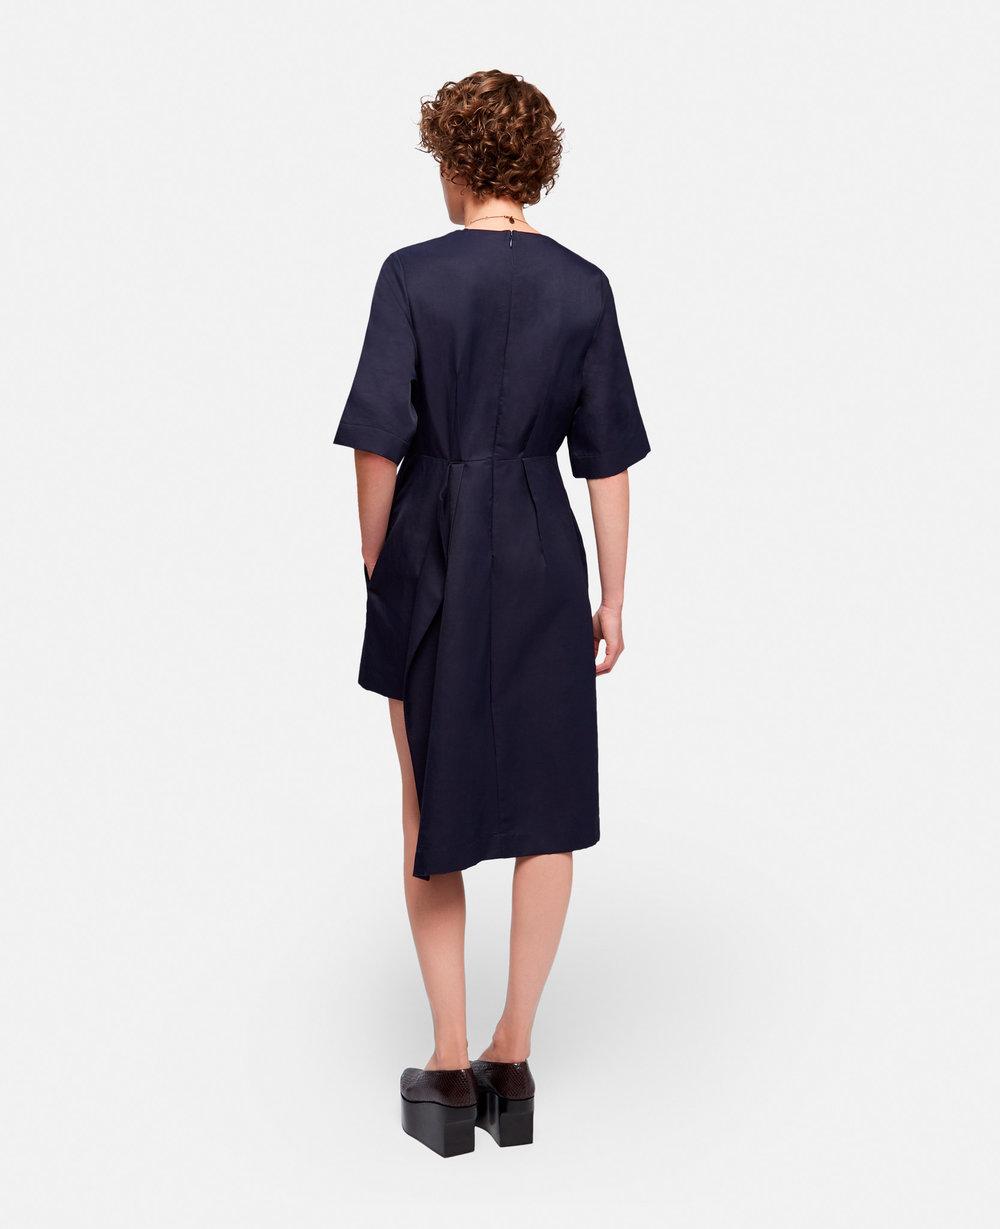 Neema Ink Asymmetric Dress, $1495